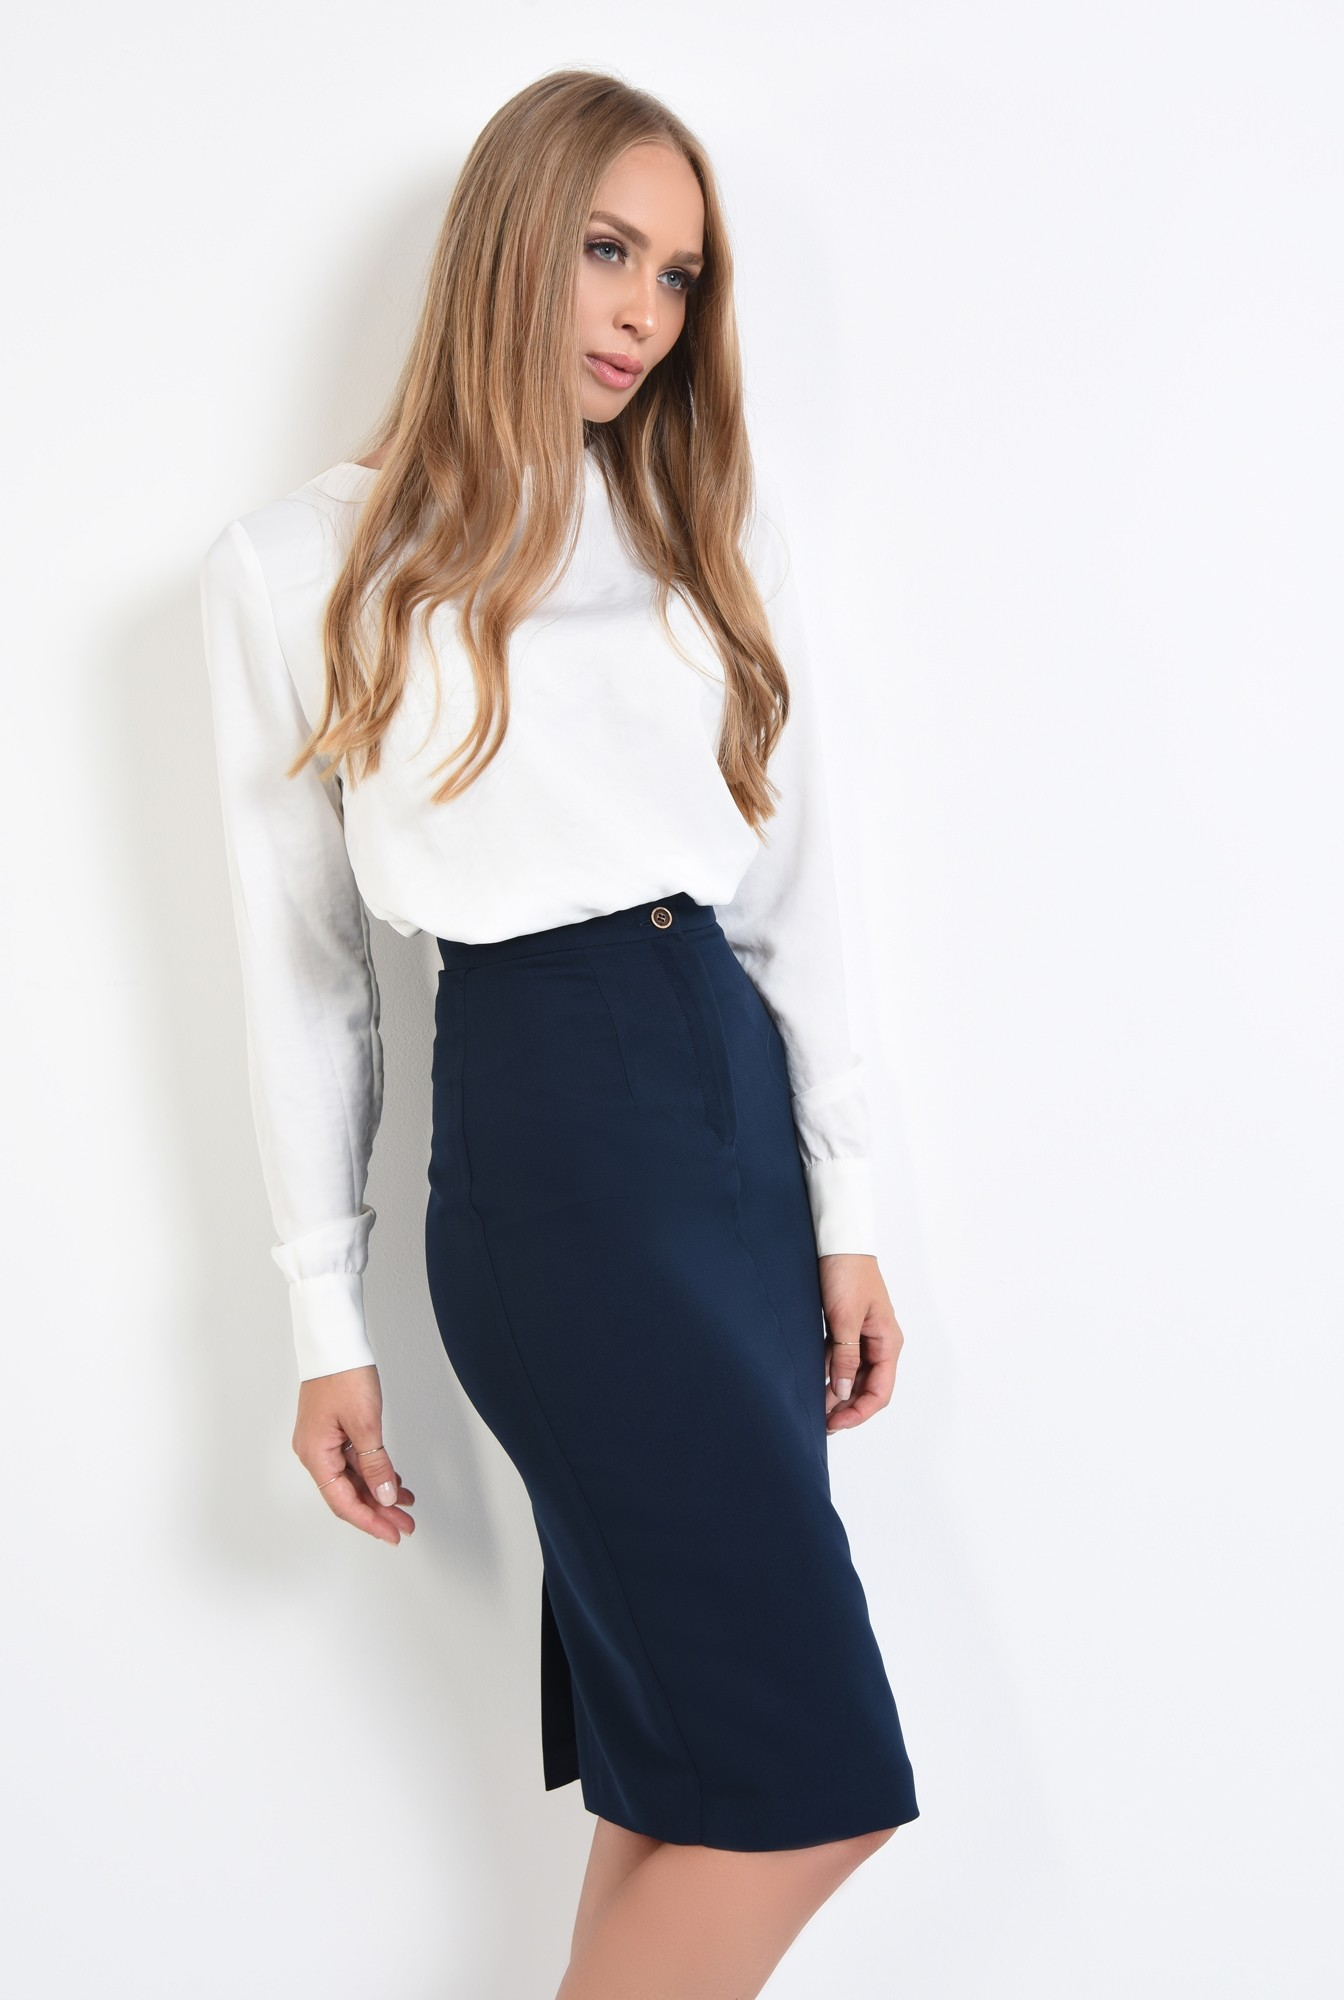 0 - 360 - bluza casual, dreapta, lejera, nasturi decorativi metalici, bluze dama